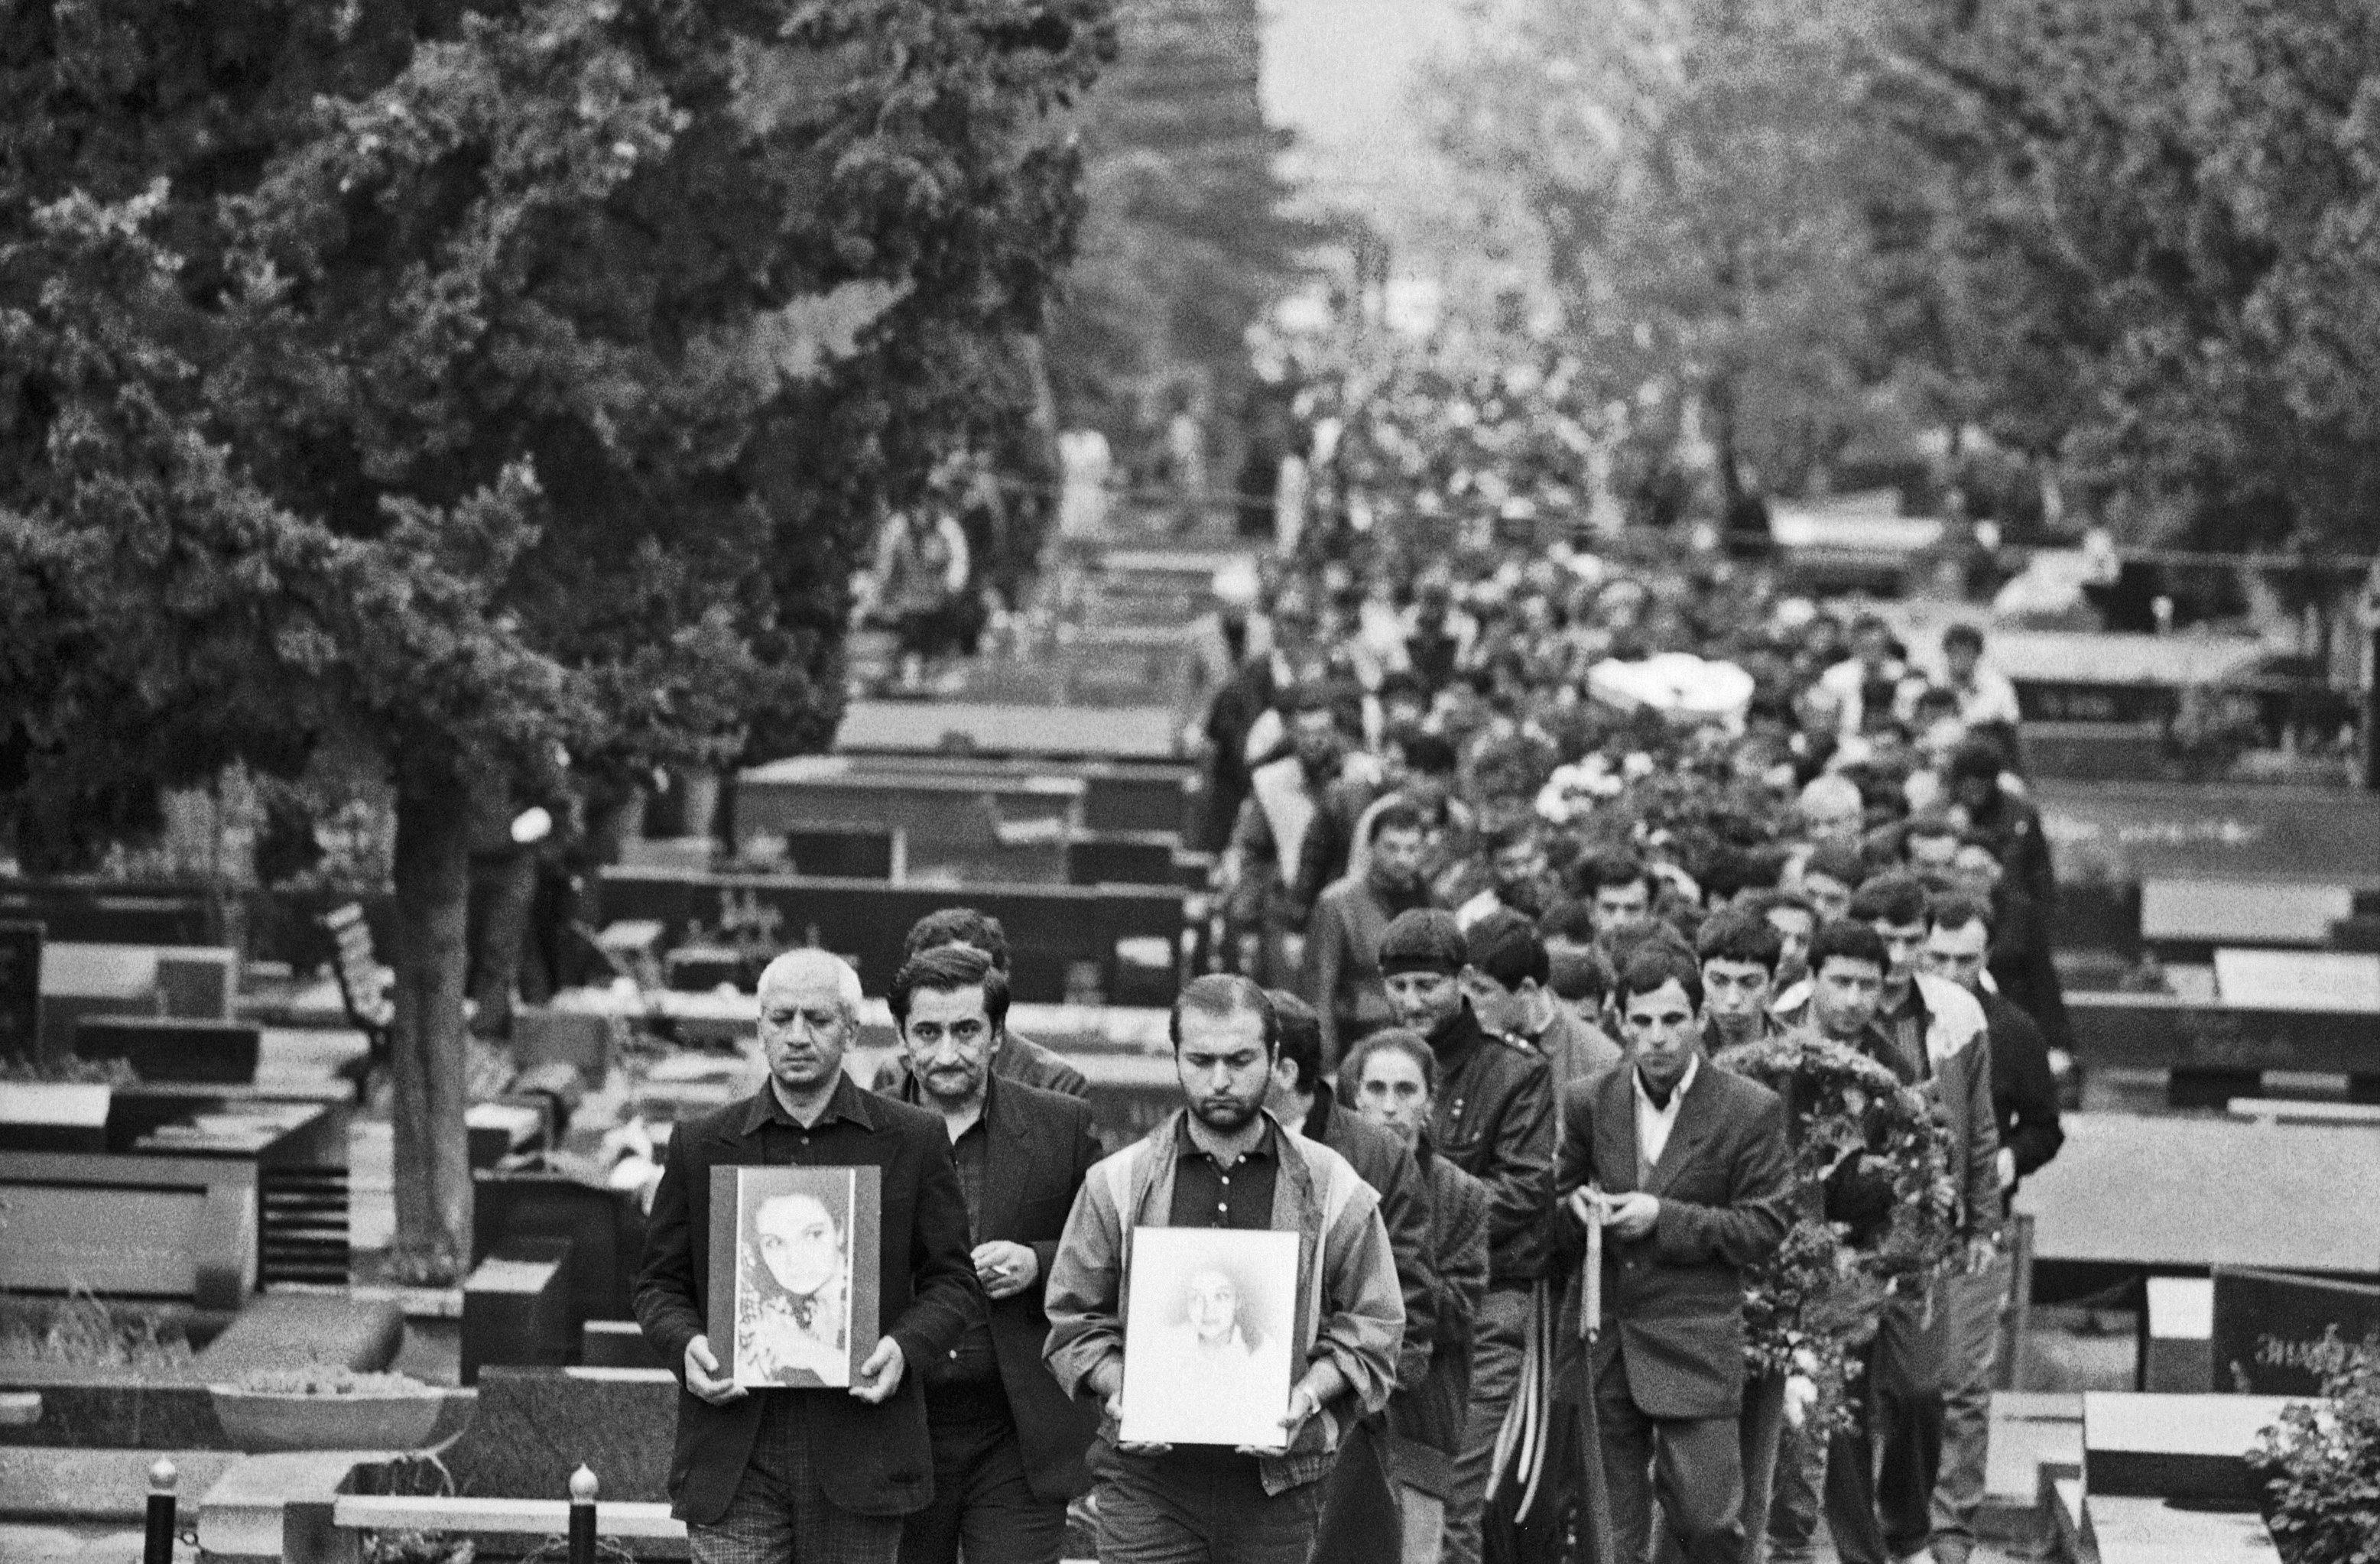 9 апреля 1989 года в Тбилиси разогнали митинг Гамсахурдиа